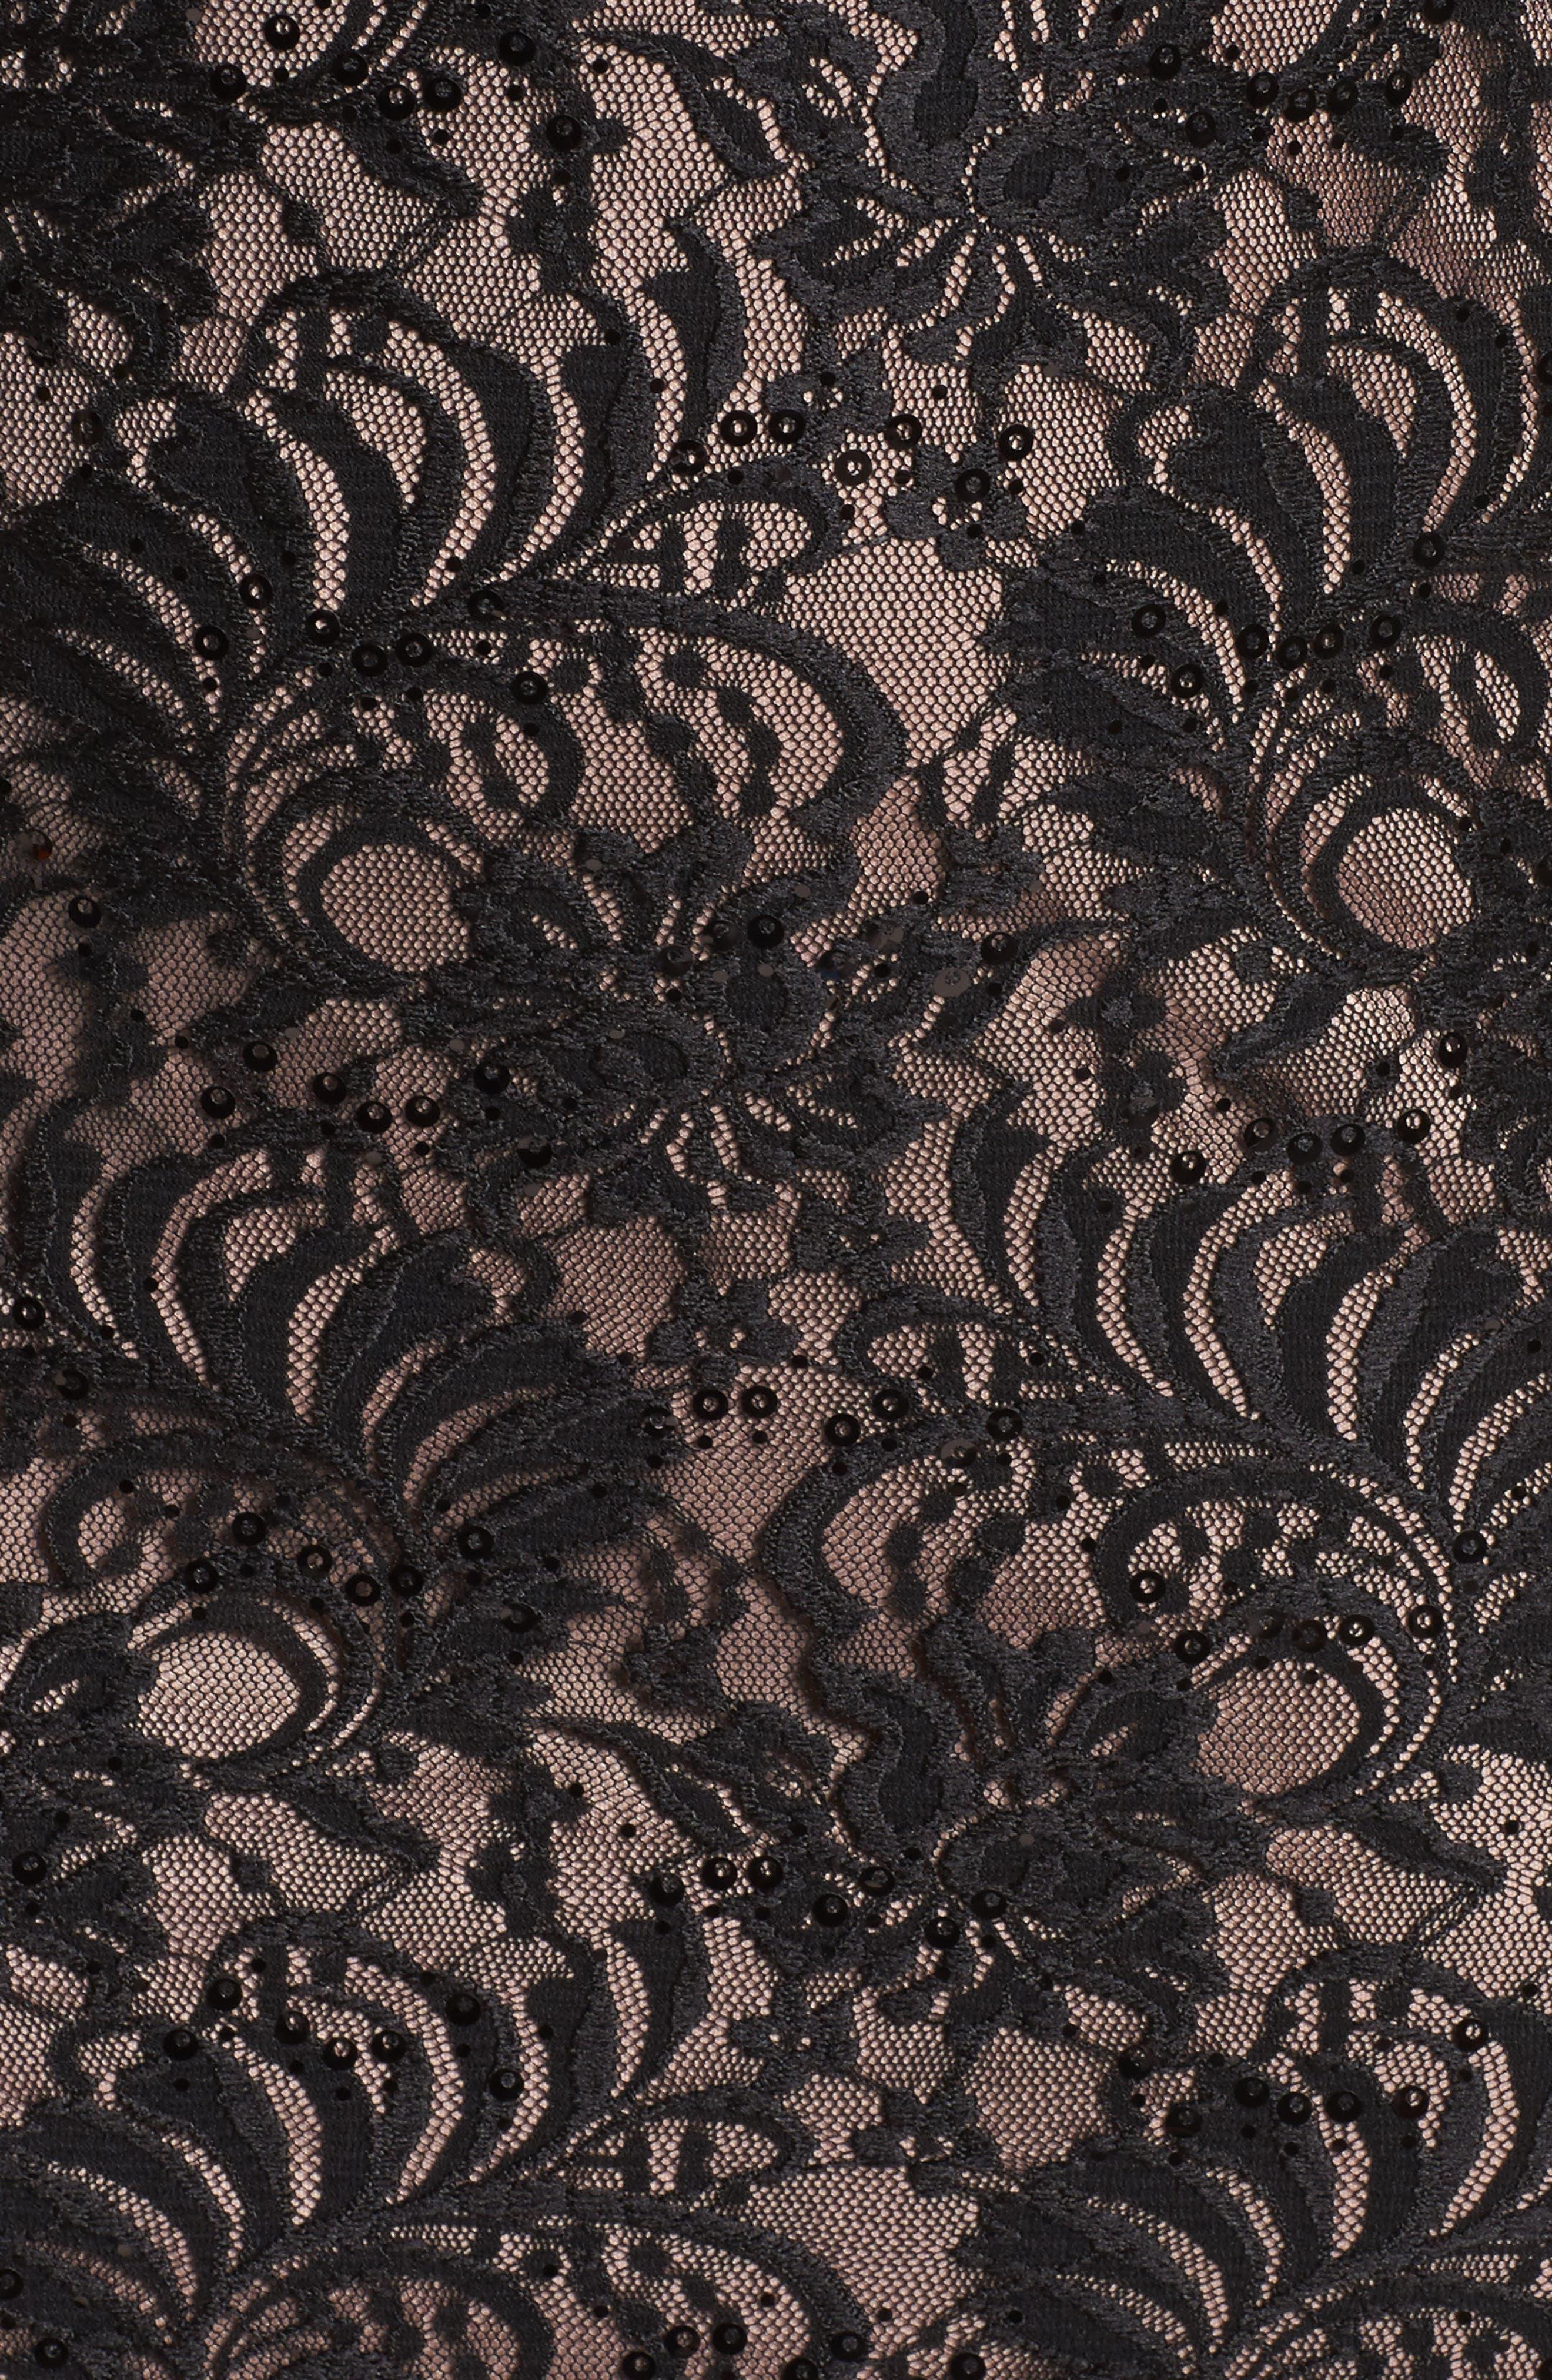 Lace Square Neck Gown,                             Alternate thumbnail 5, color,                             BLACK/ NUDE